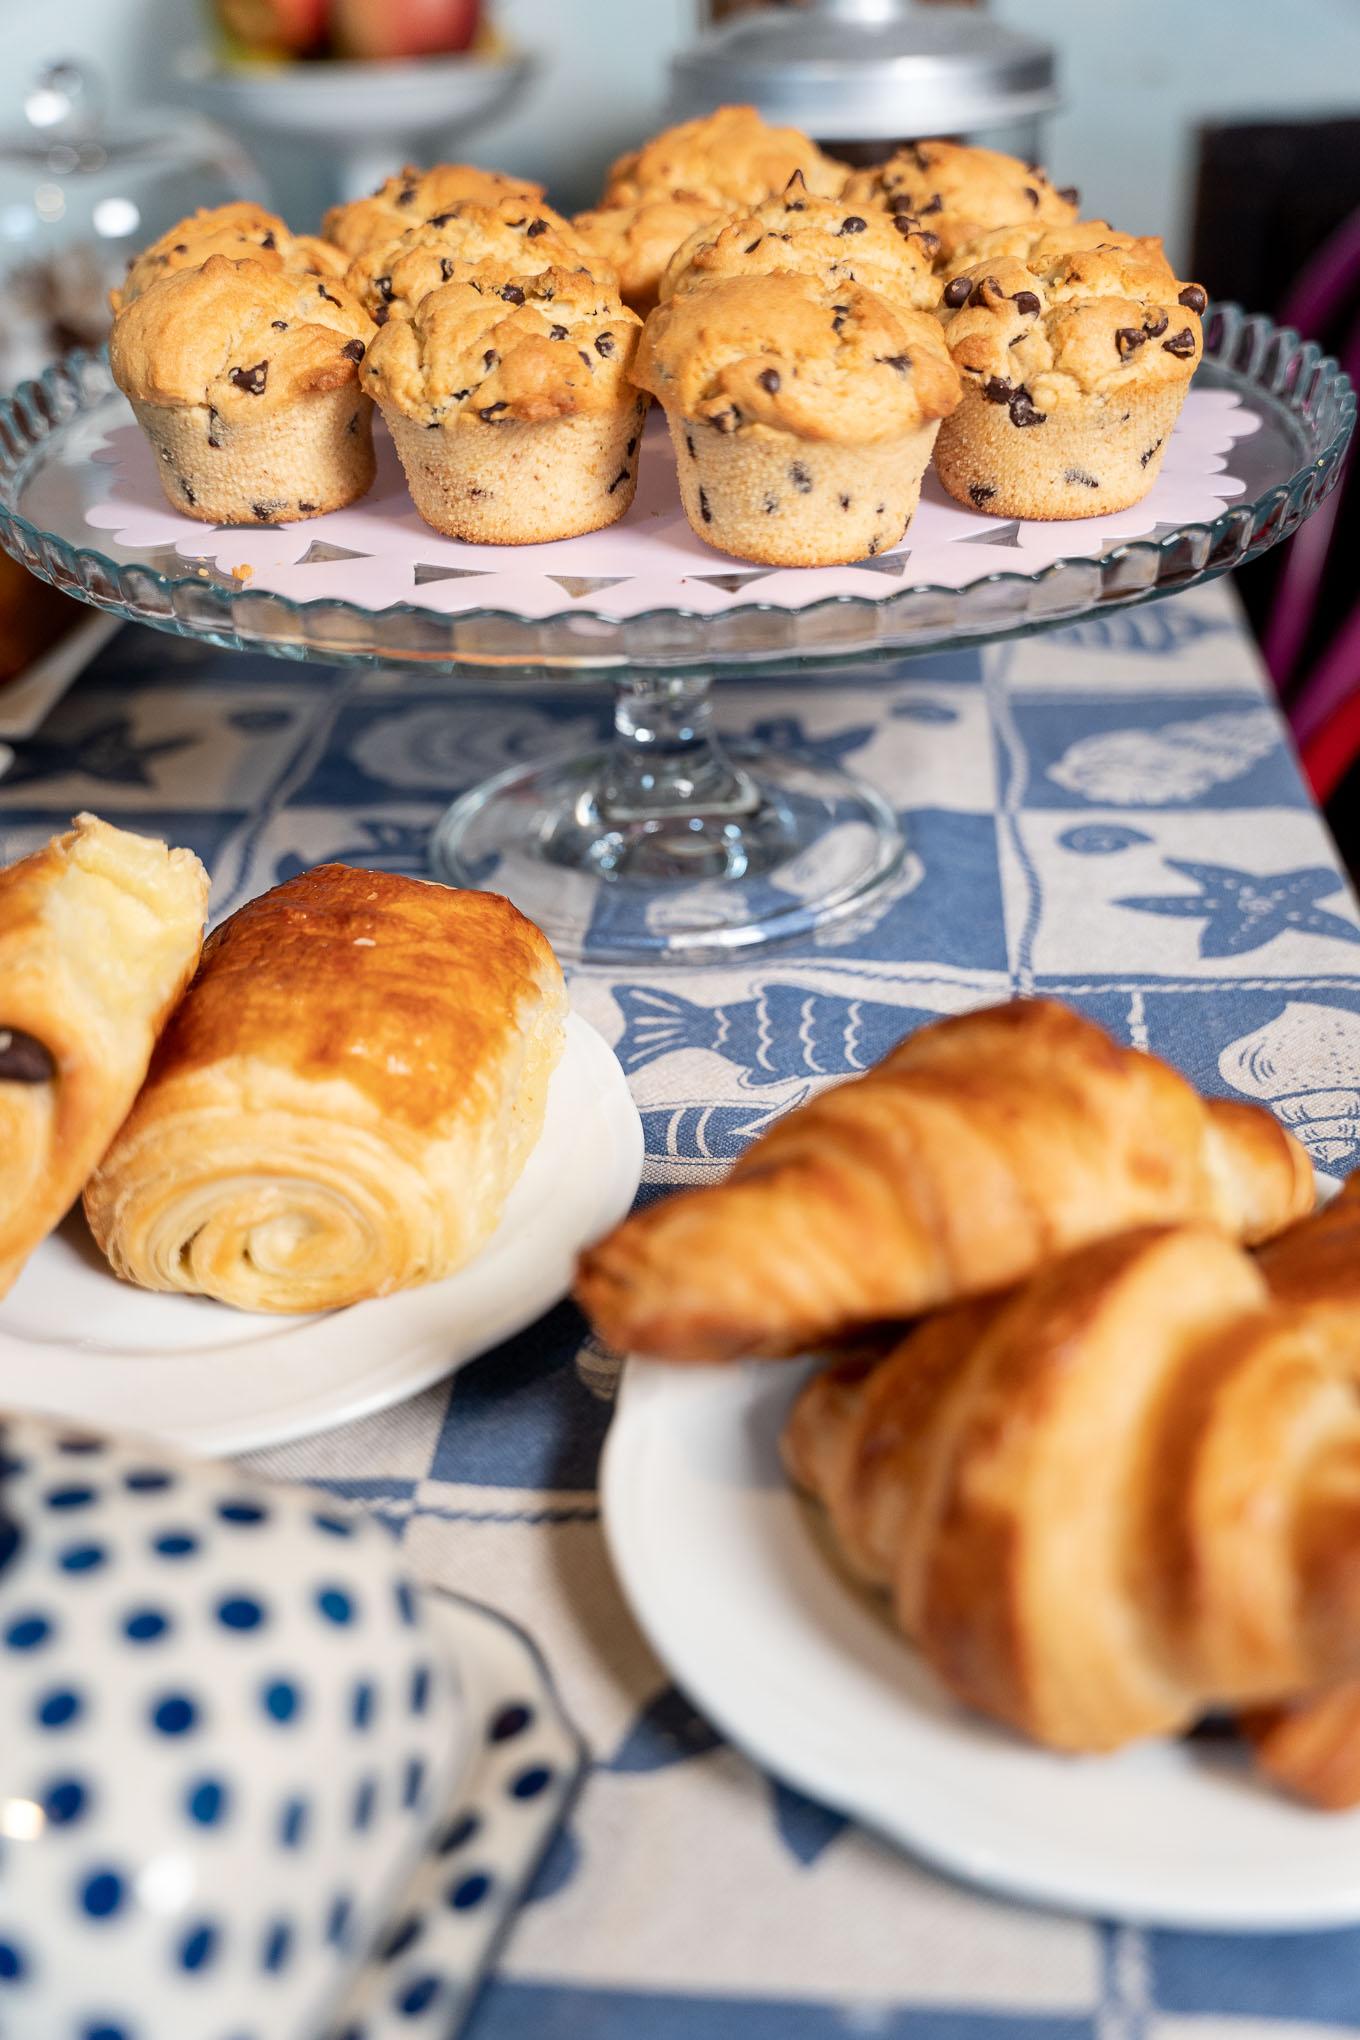 Breakfast & Bakery Standard B&B Civitanova Marche